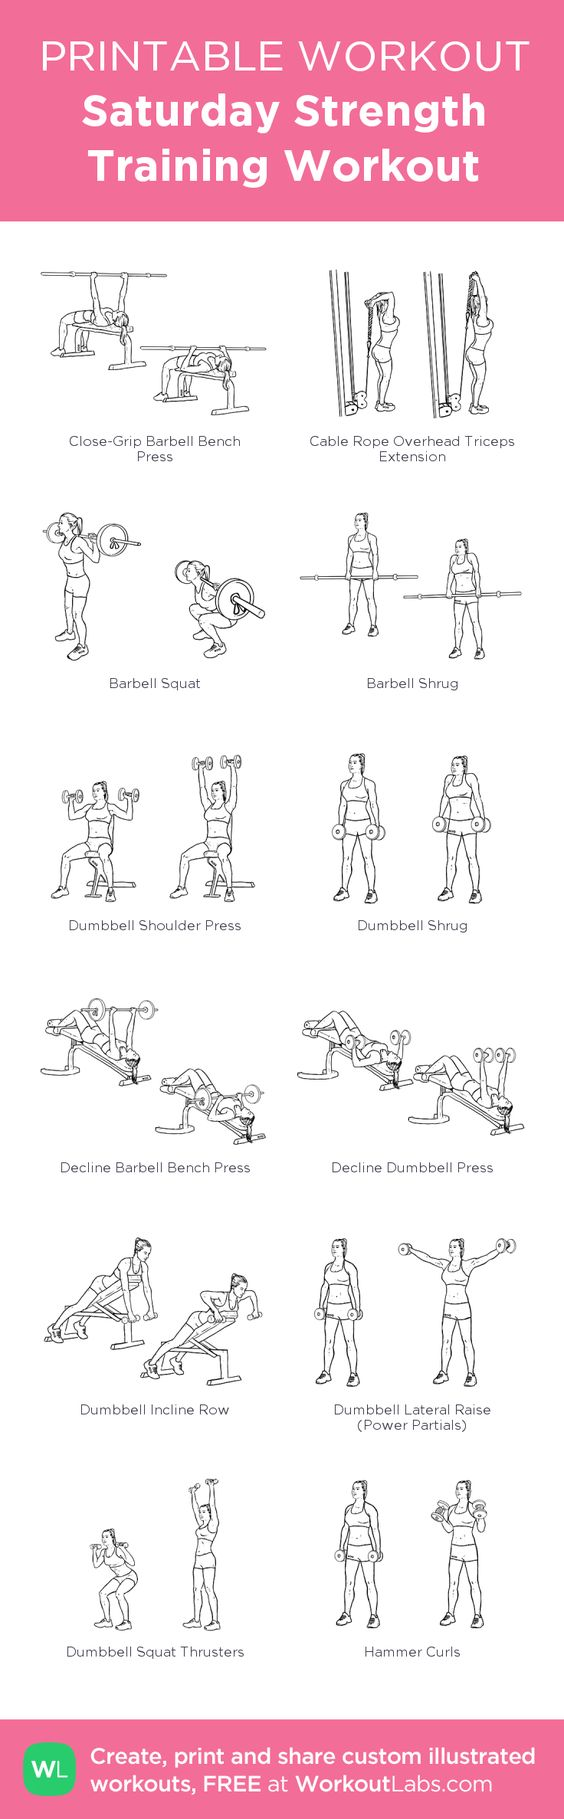 Saturday Strength Training Workout:my custom printable workout by @WorkoutLabs #workoutlabs #customworkout